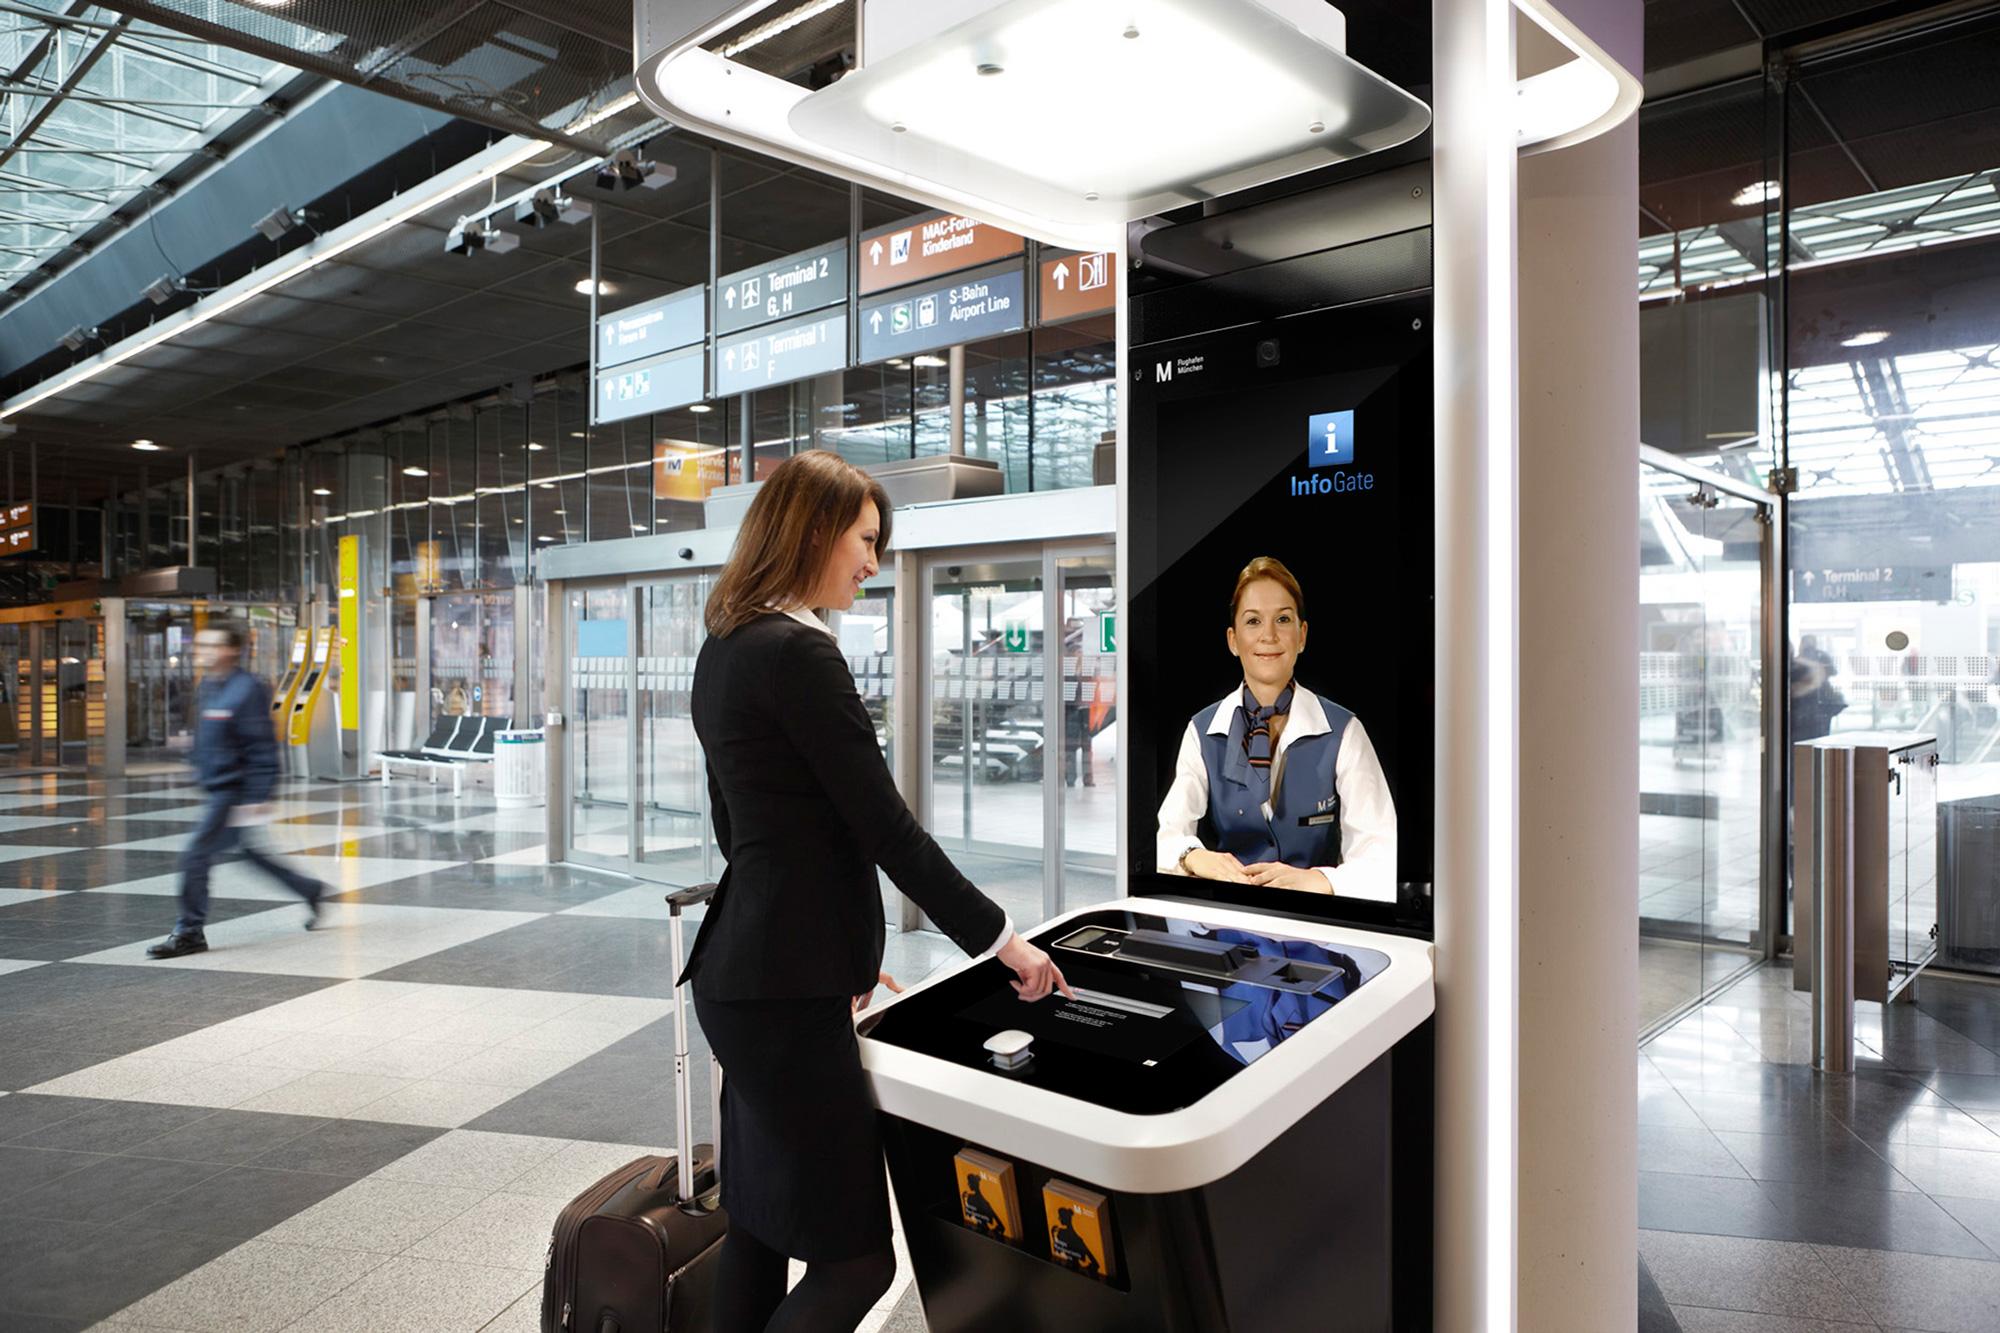 InfoGate_Flughafen_Muenchen_gr